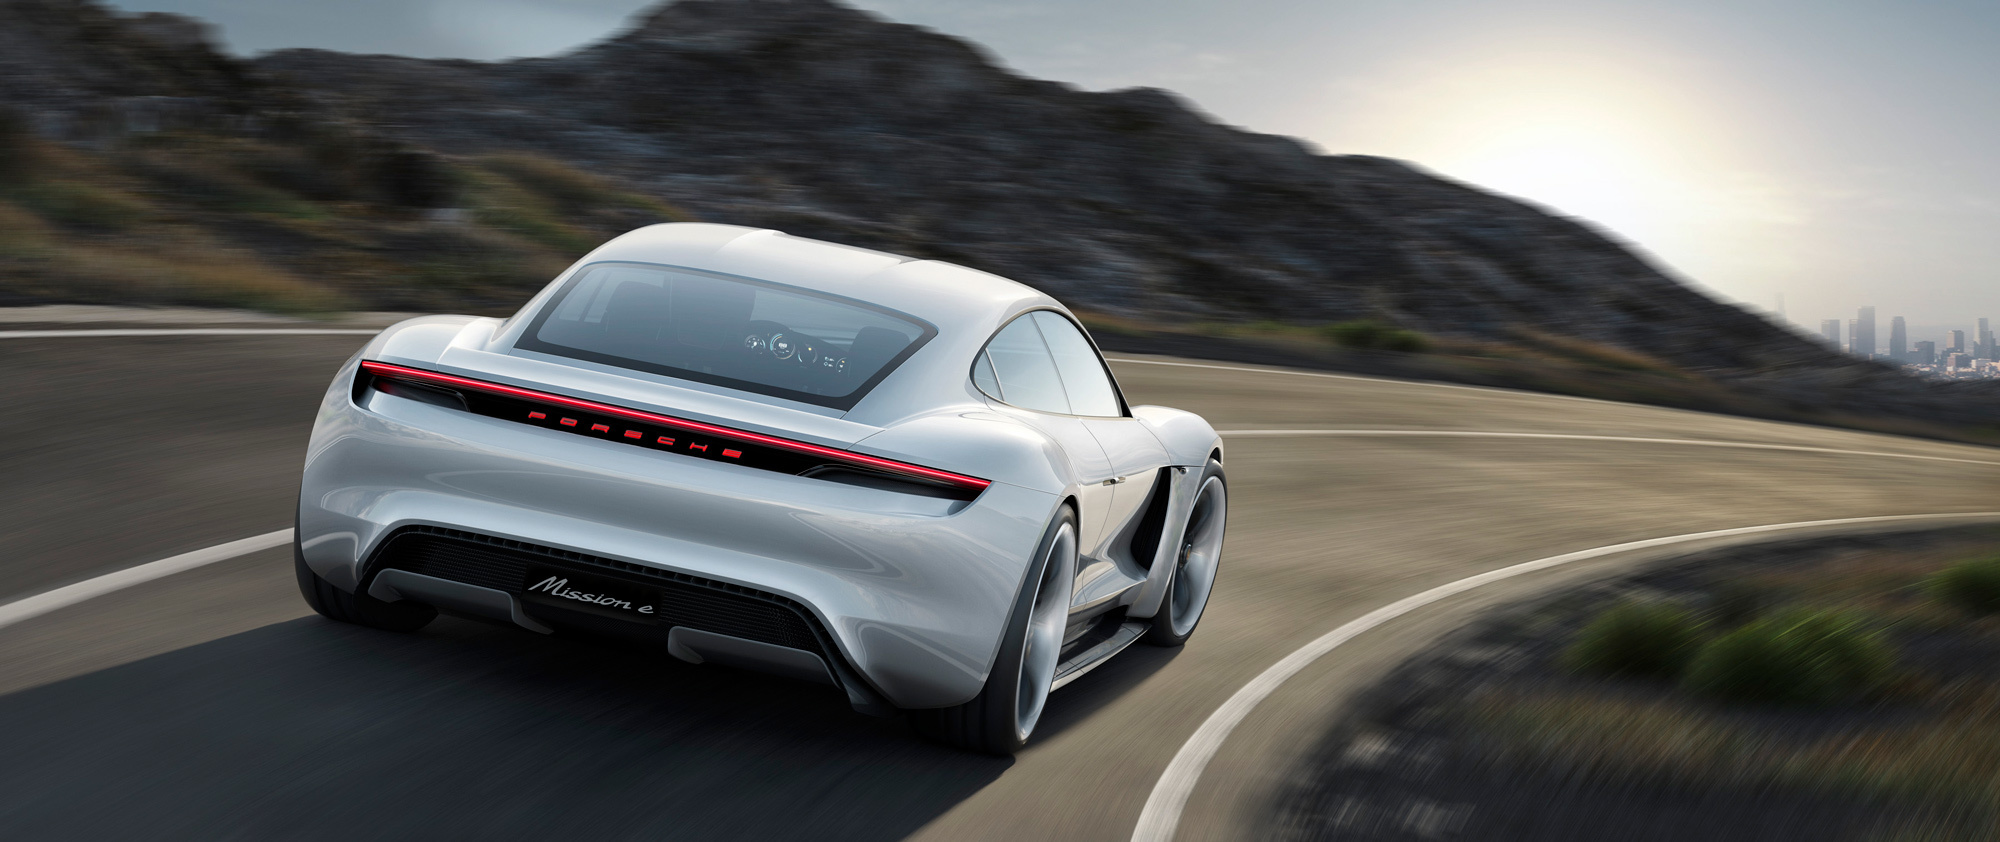 Pictures Of Porsche Mission E